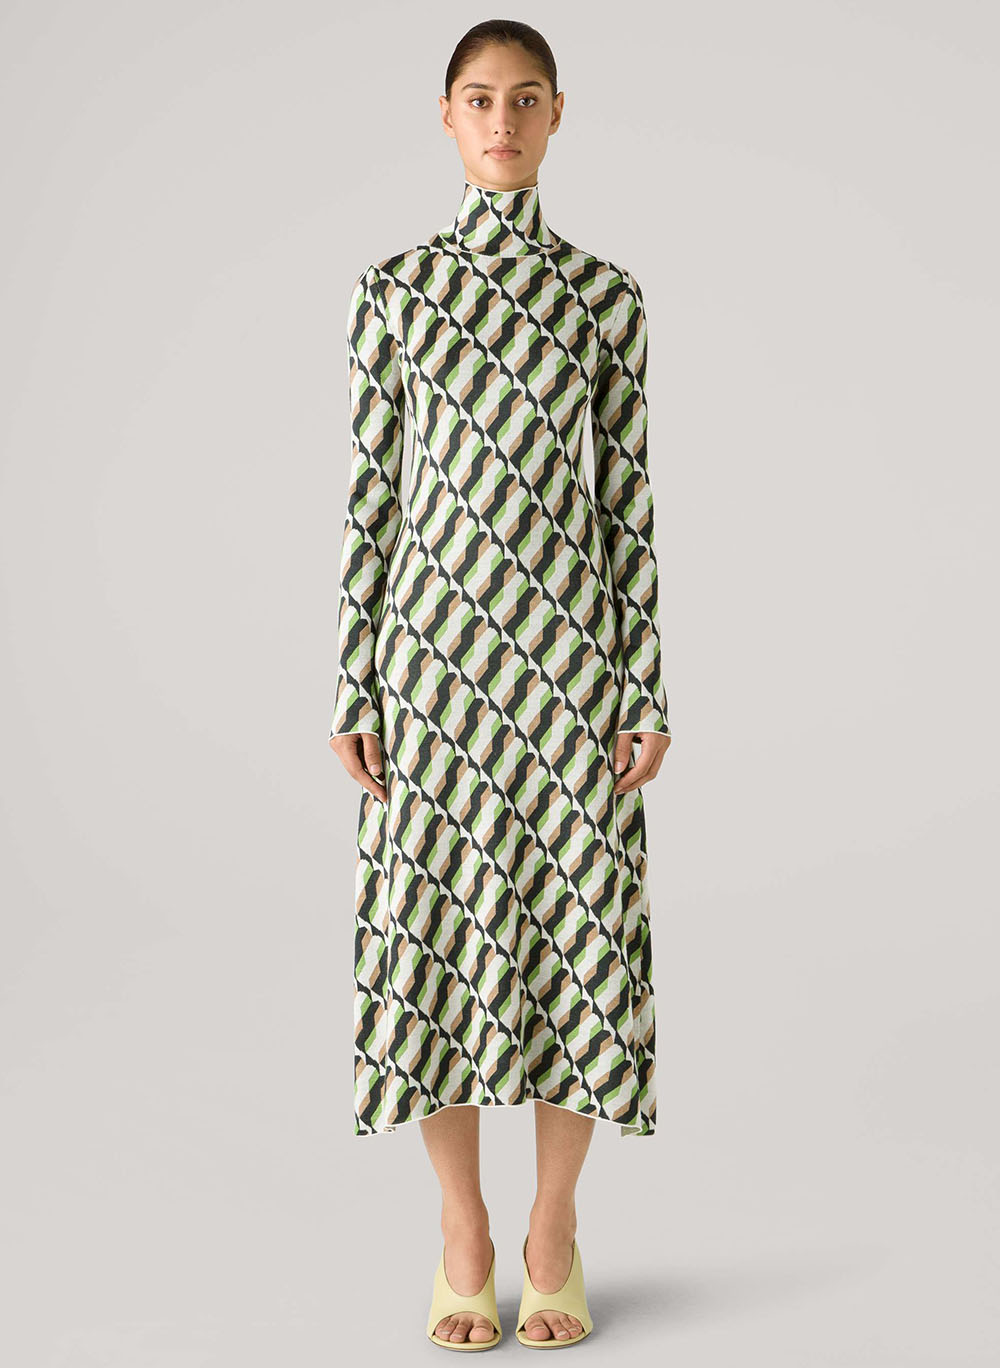 St John Fall 2021 Geometric Print Dress I DreaminLace.com